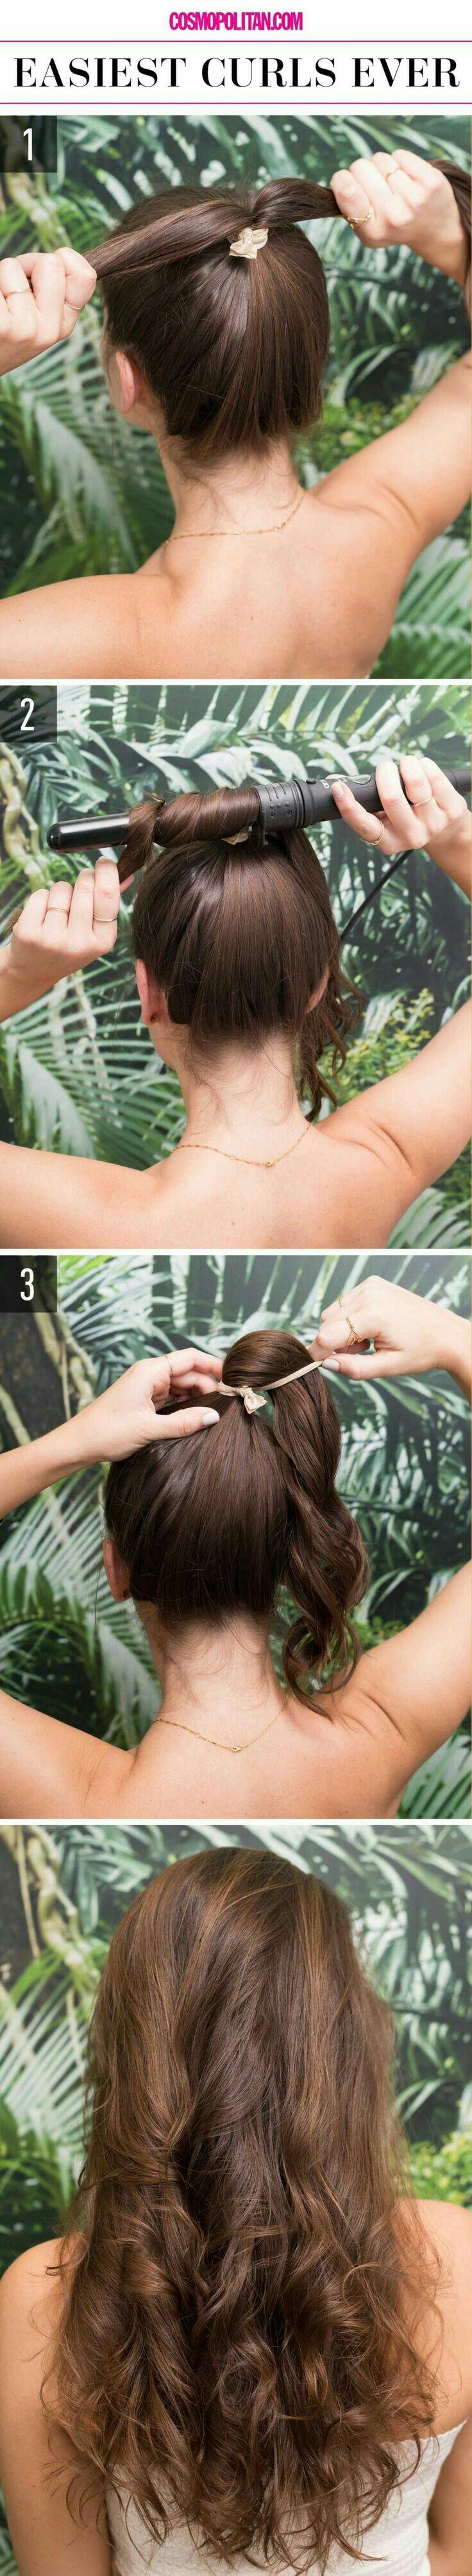 Pin by haniya malik on hair styles pinterest hair style